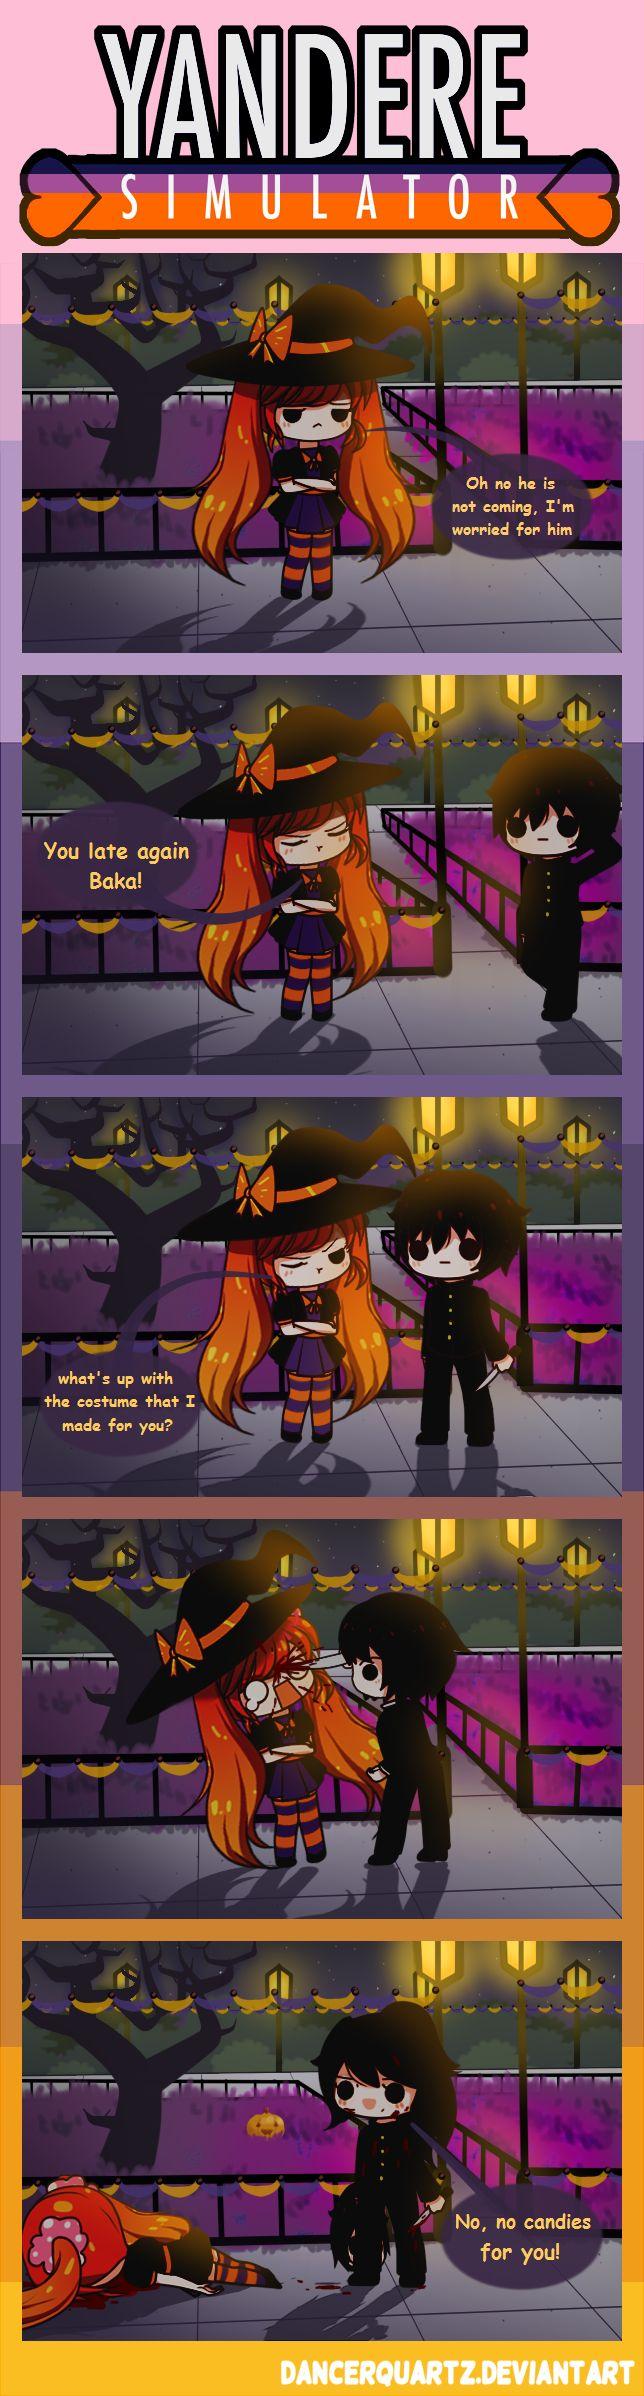 Yandere Comic - The killer Senpai by DancerQuartz on DeviantArt